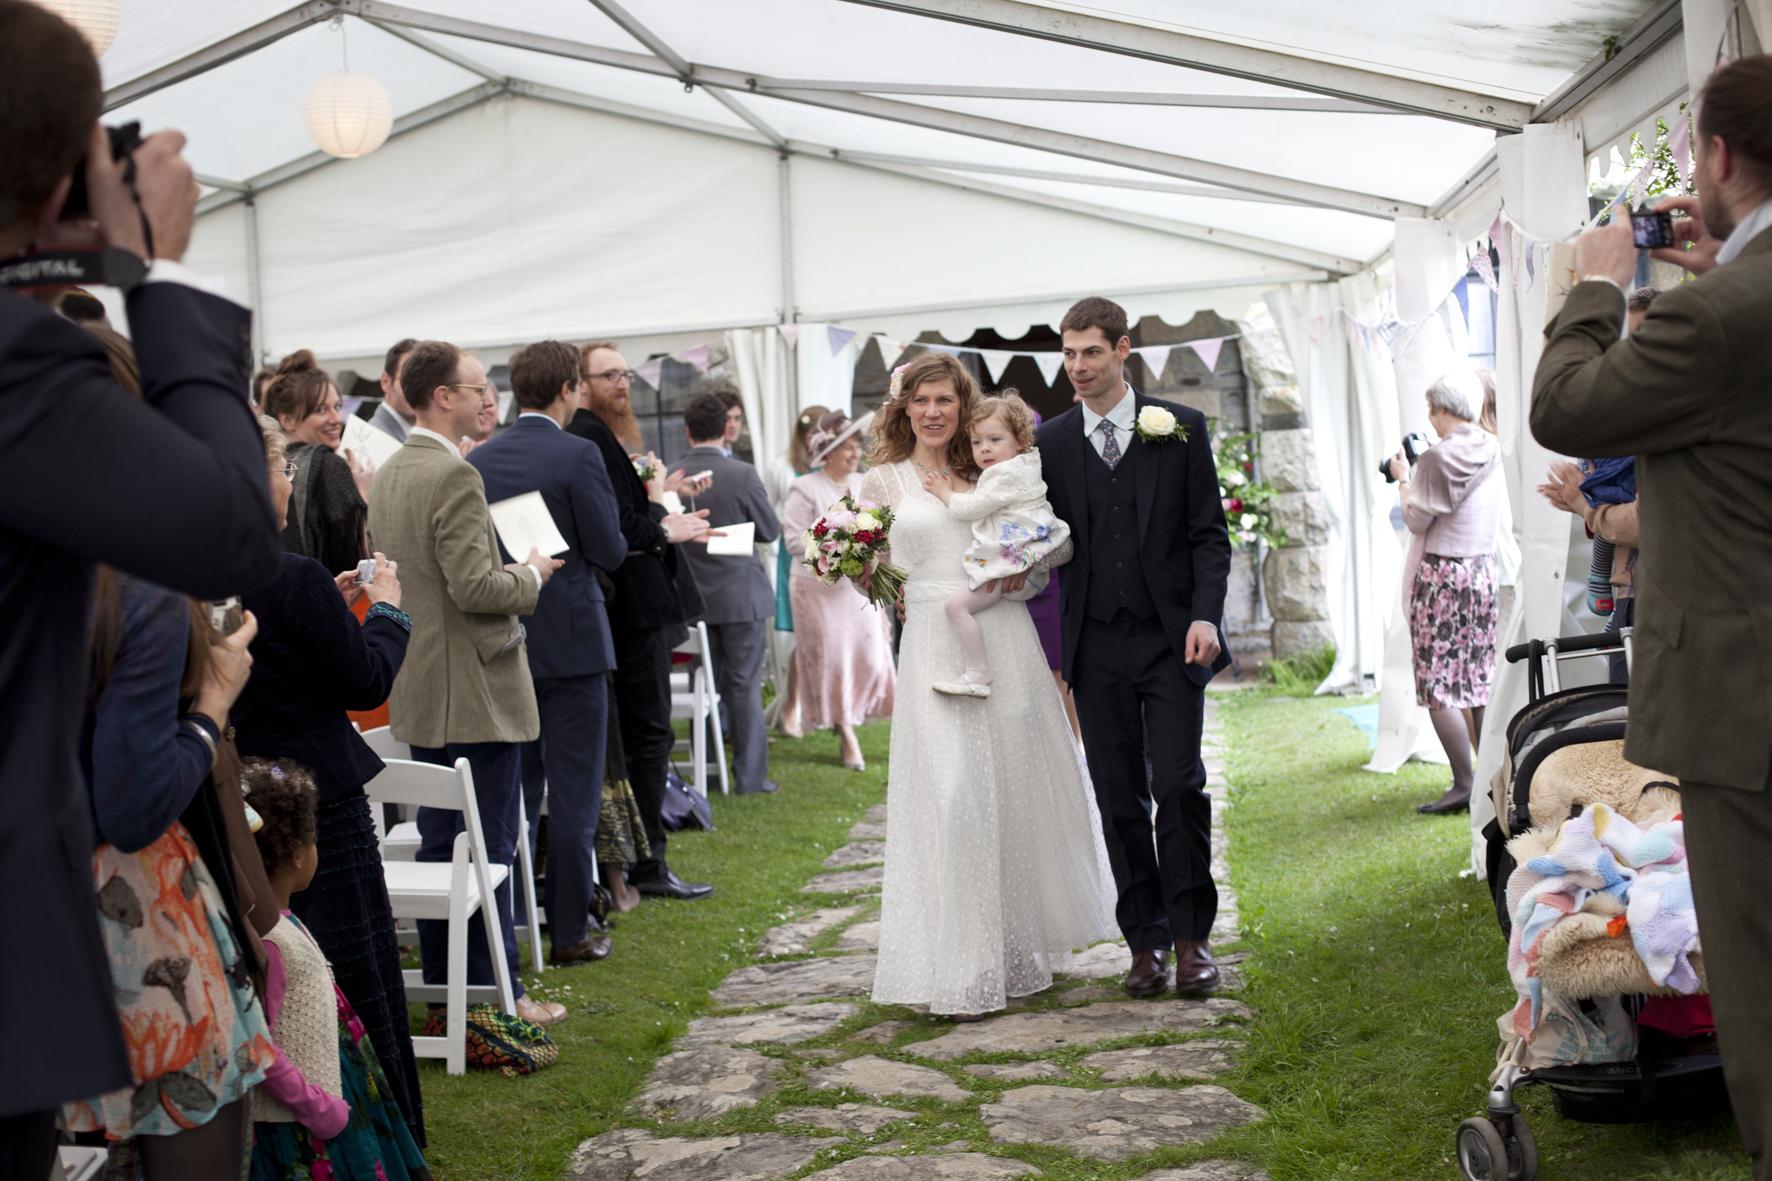 Wedding example_M&P__MG_3543_Claudia Leisinger.jpg